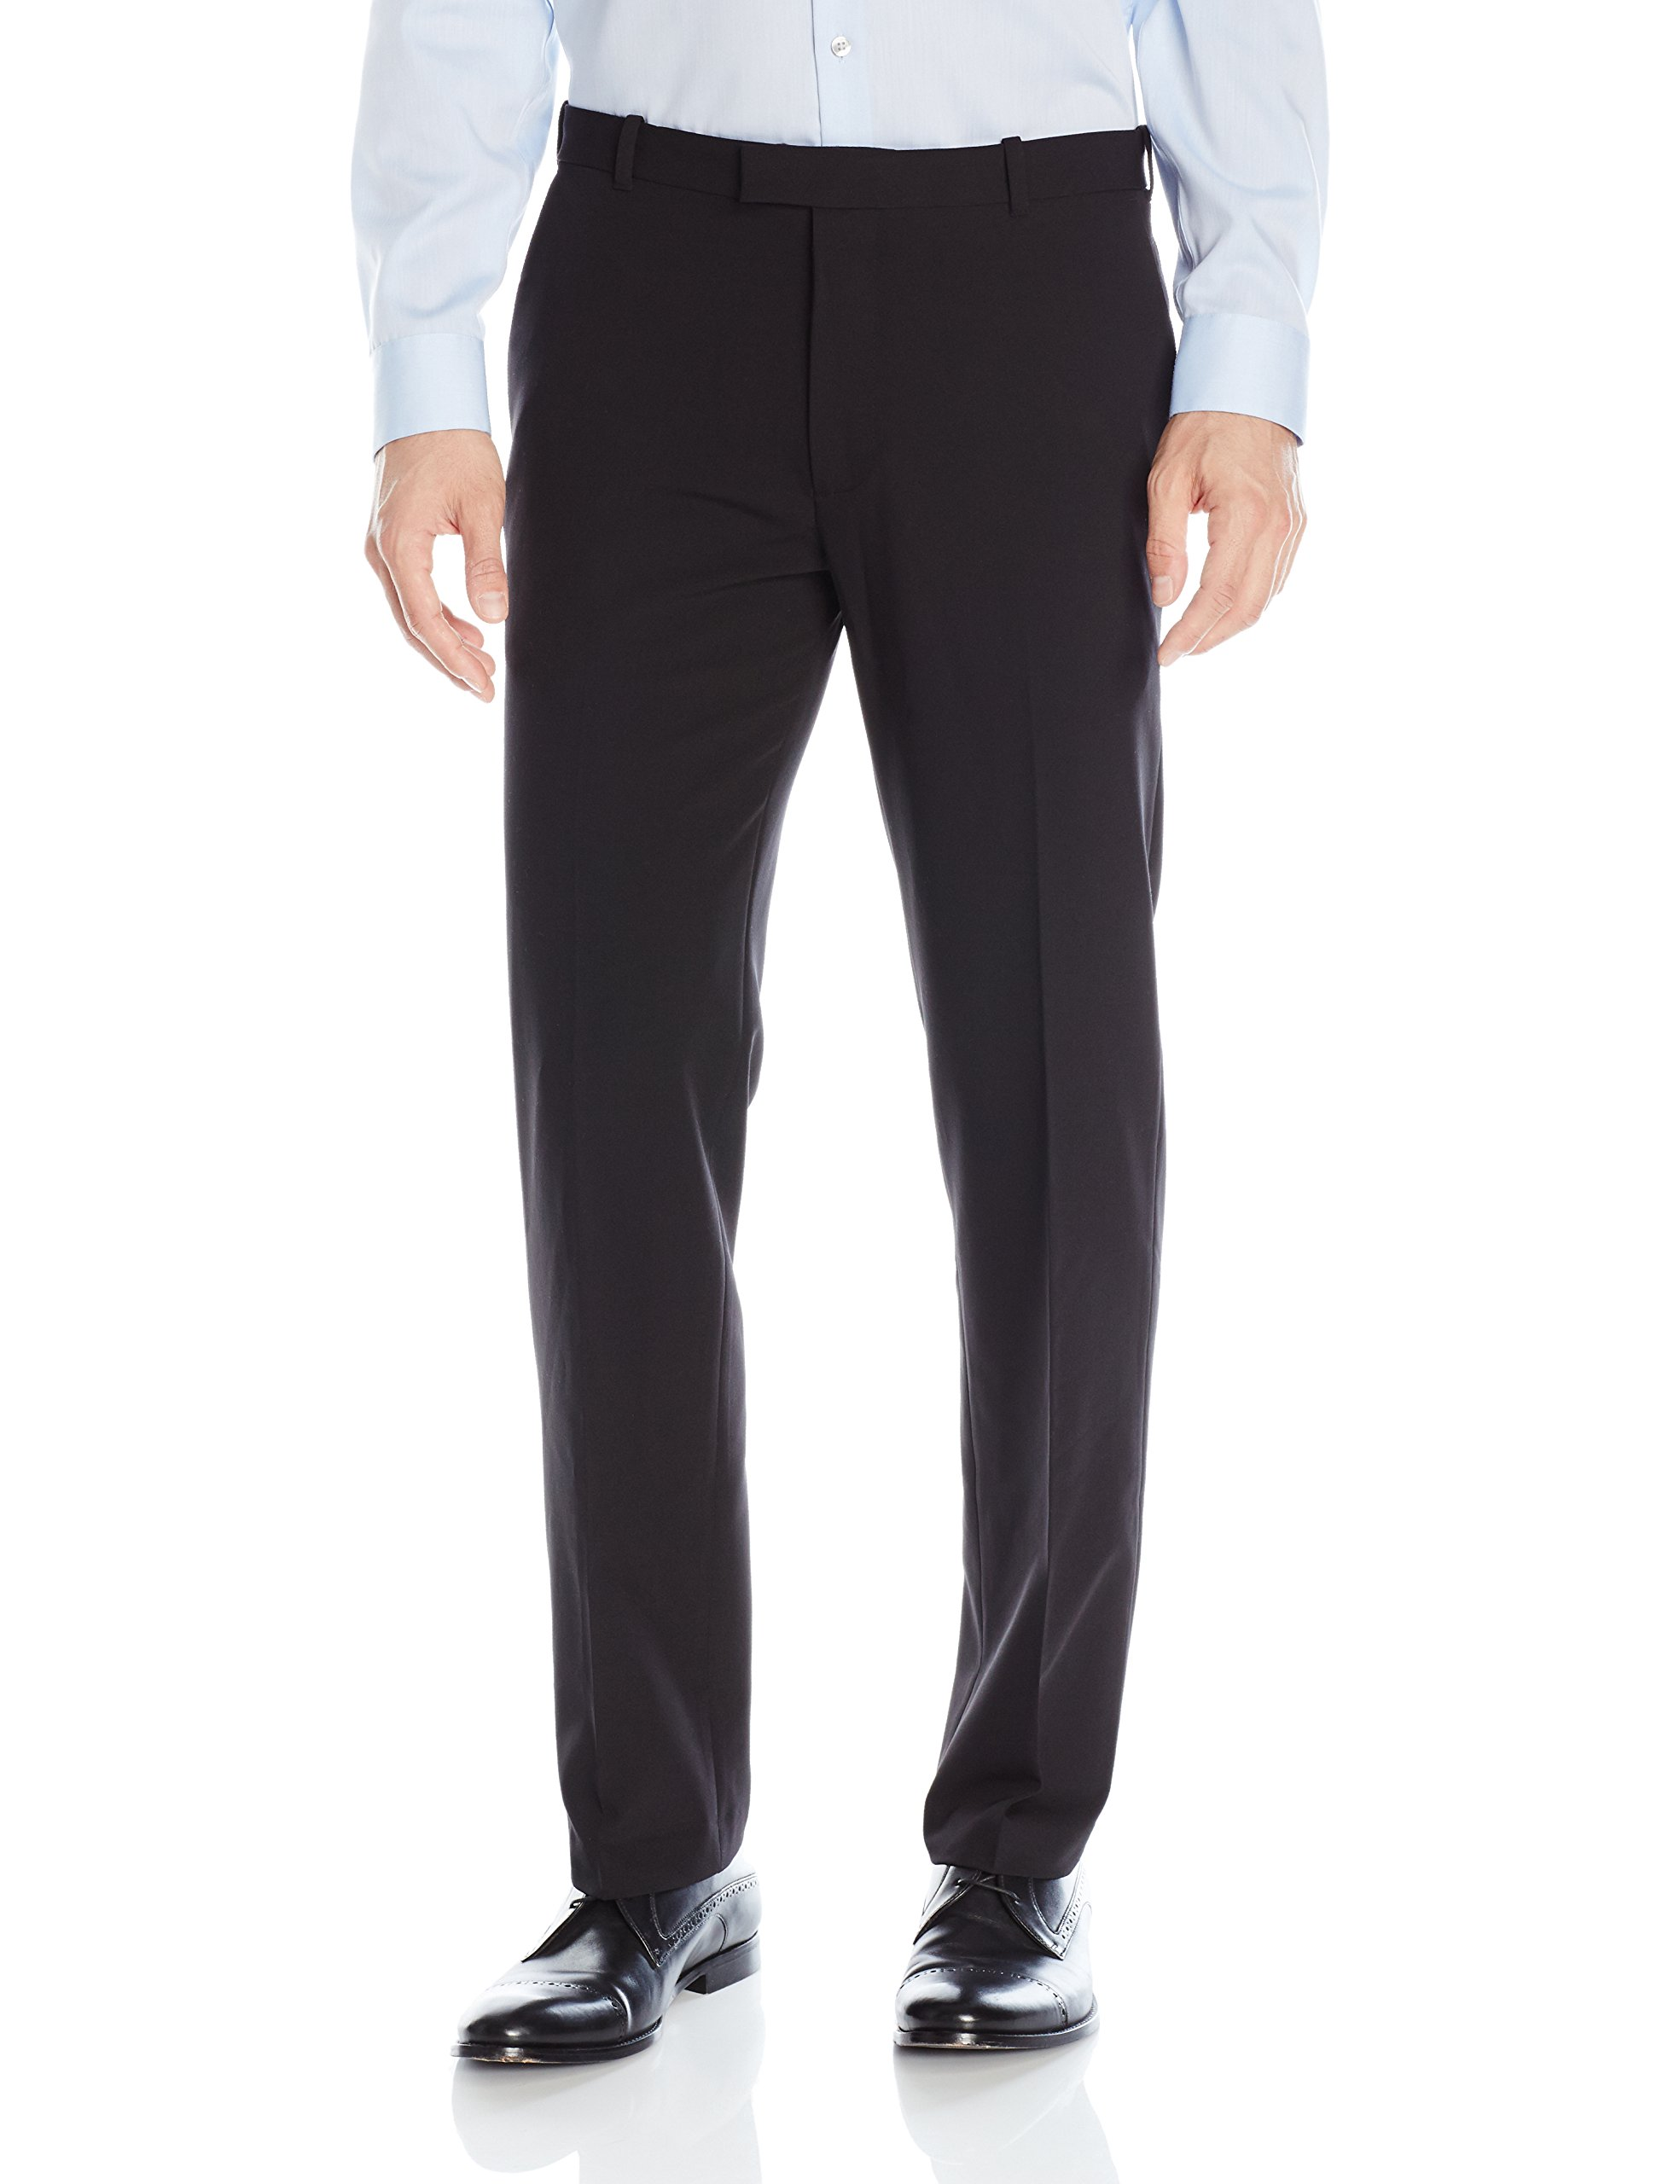 Van Heusen Men's Flex Straight Fit Flat Front Pant, Black, 34W x 32L